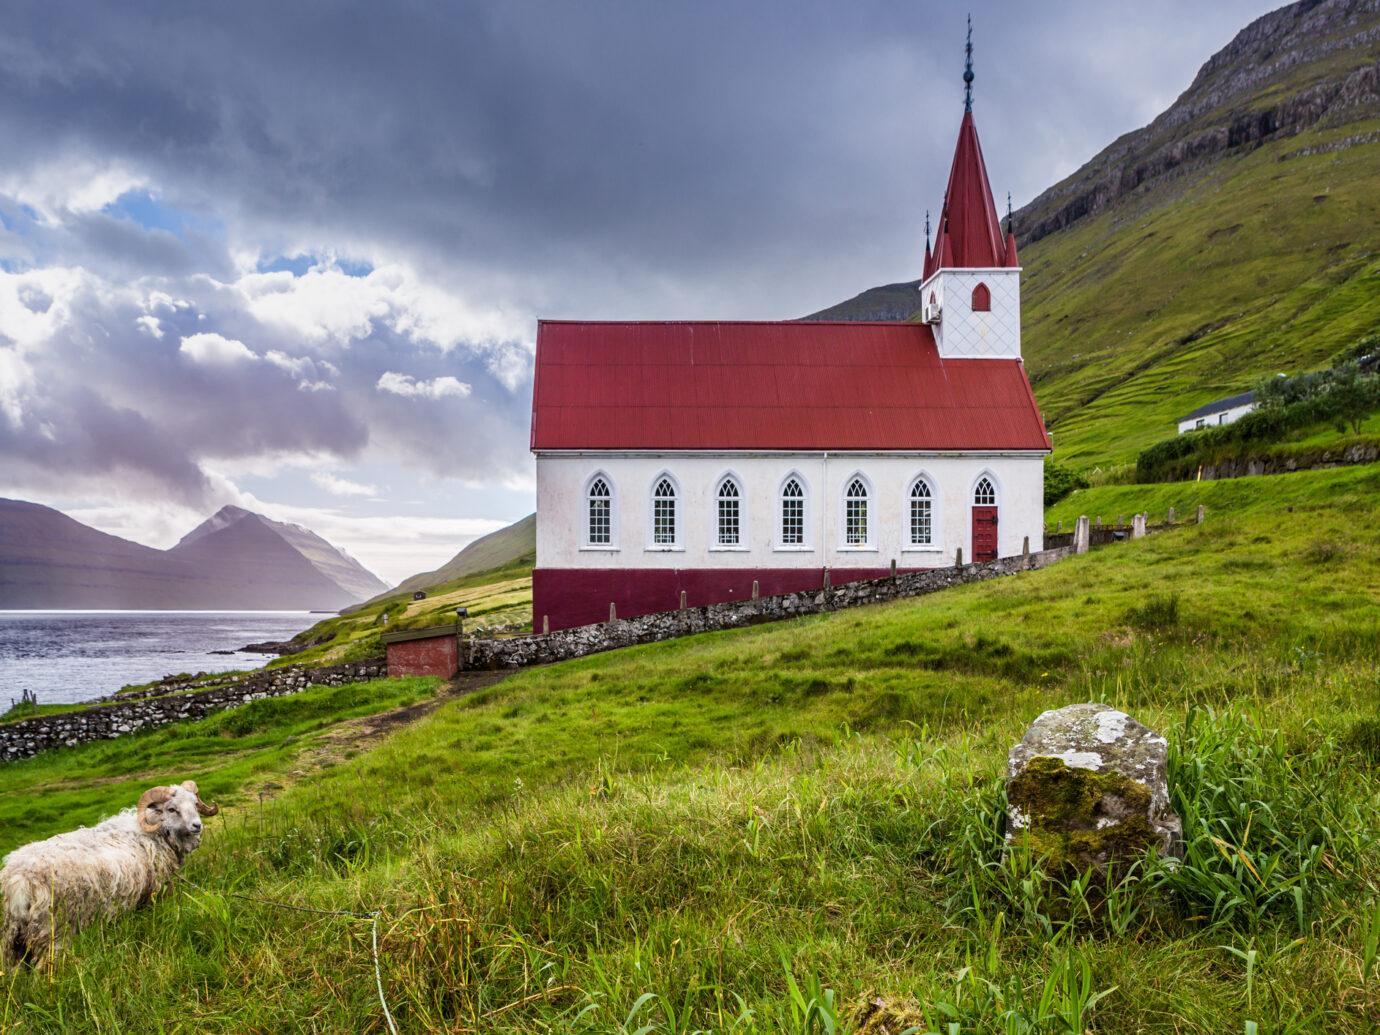 Kalsoy church in Faroe Islands whit sheep